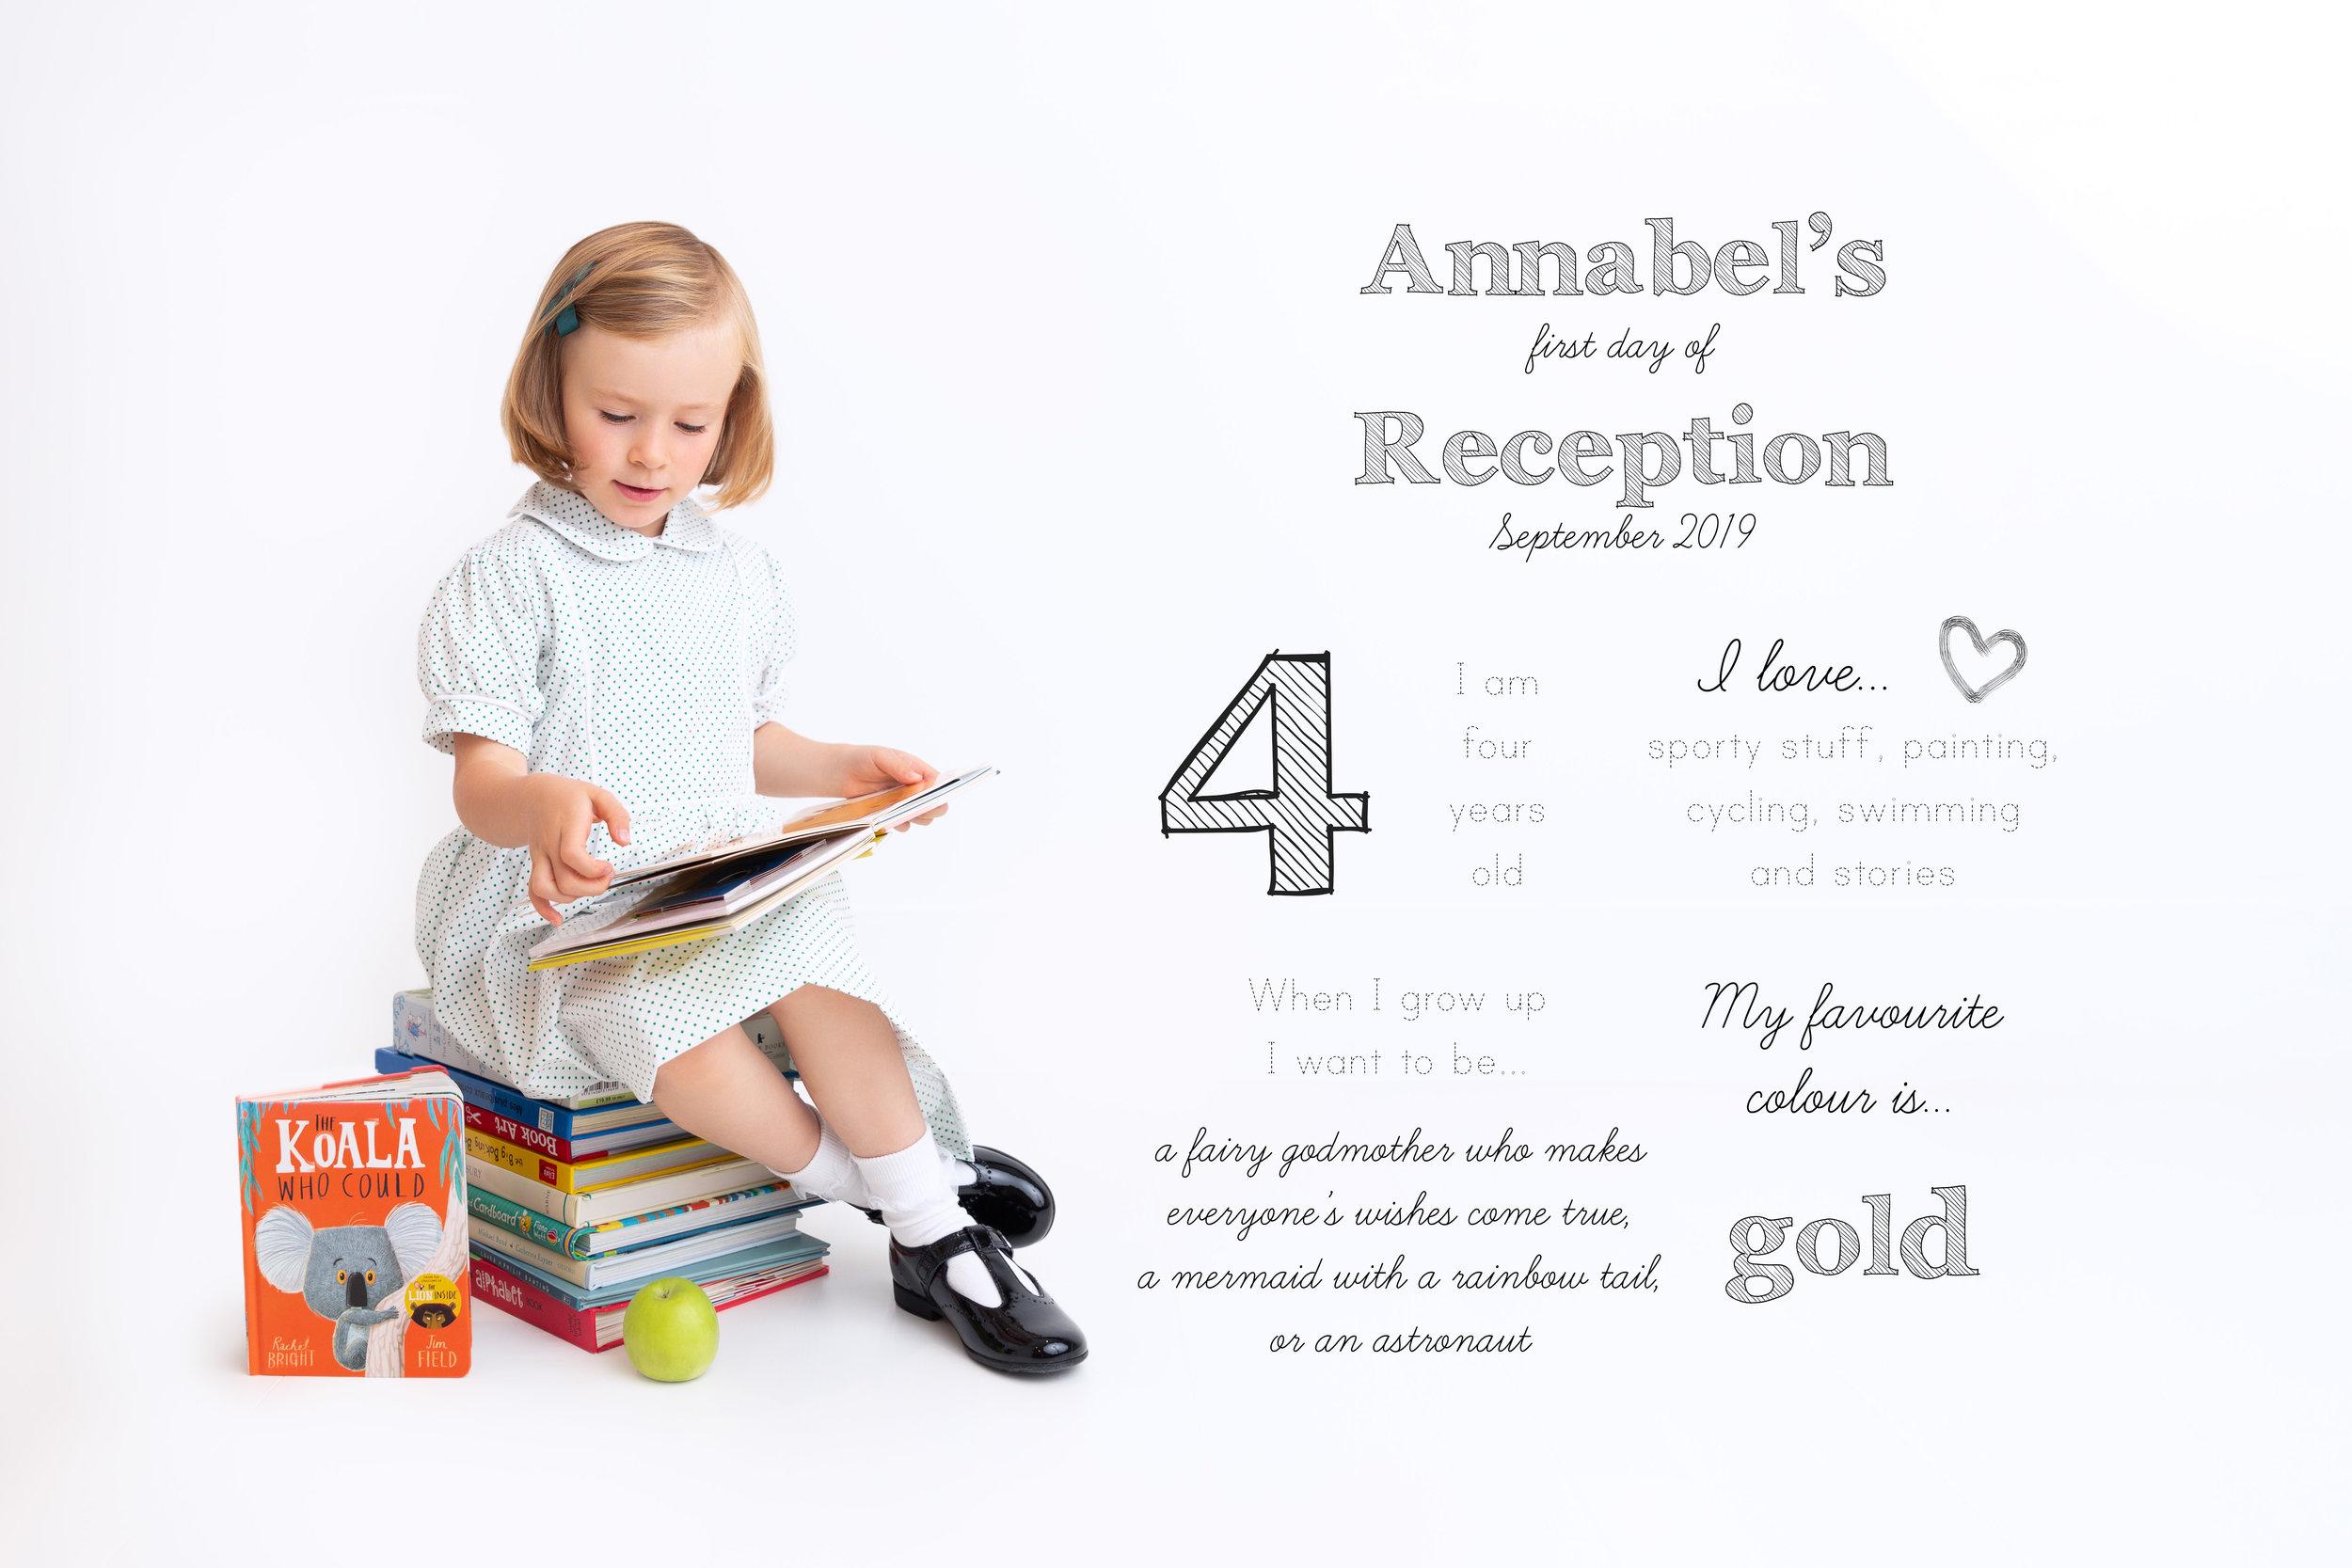 Annabel-3.jpg